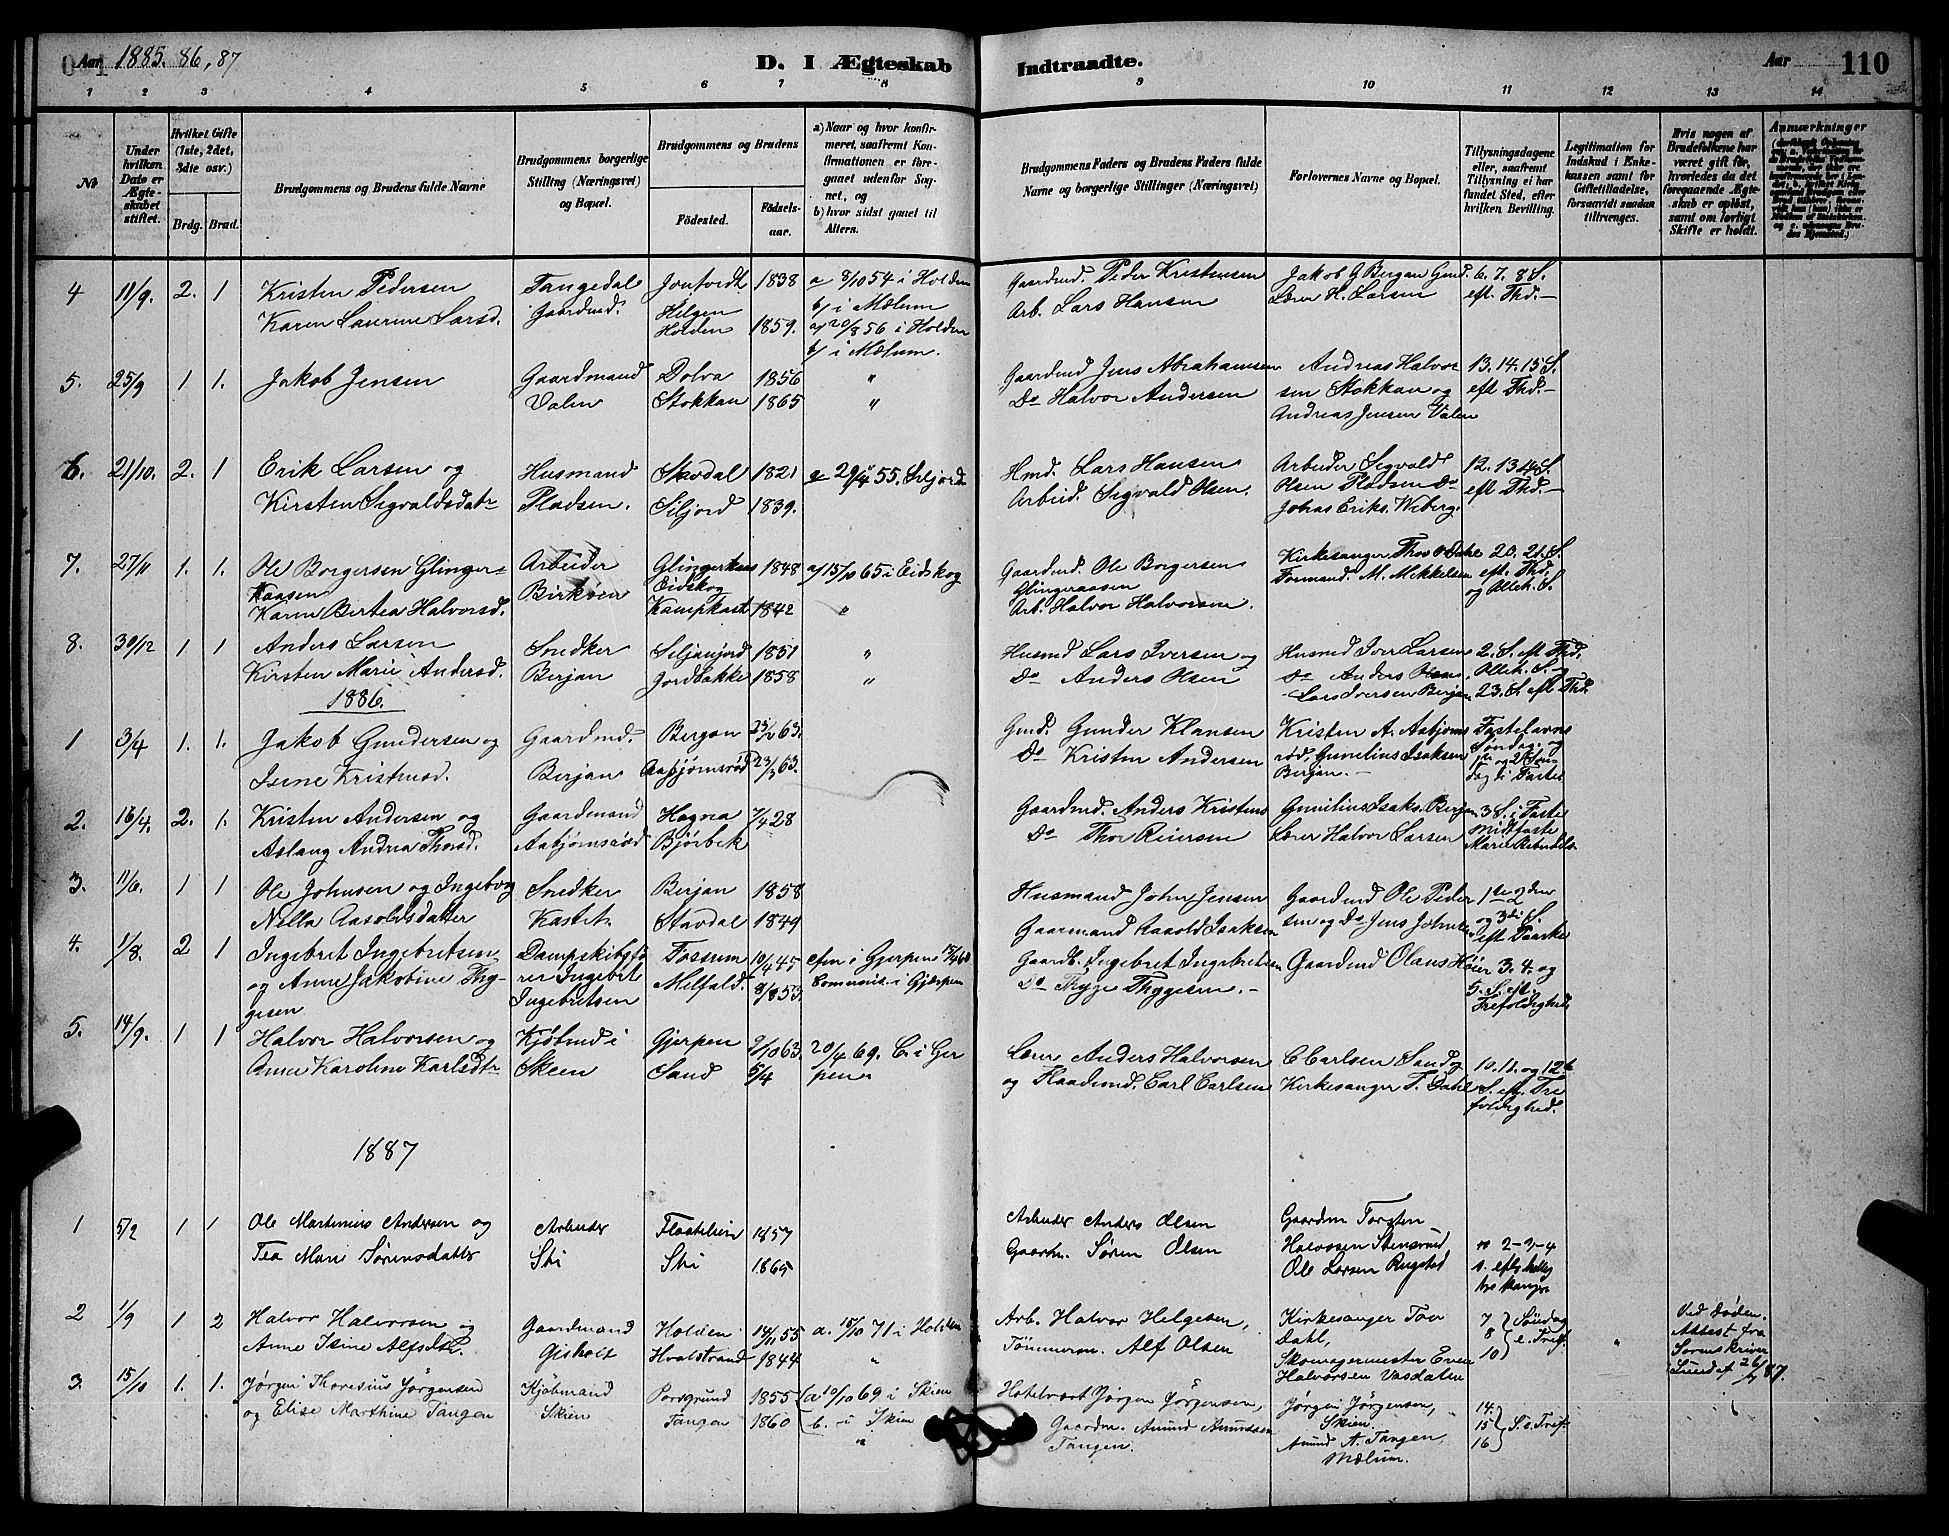 SAKO, Solum kirkebøker, G/Gb/L0003: Klokkerbok nr. II 3, 1880-1898, s. 110